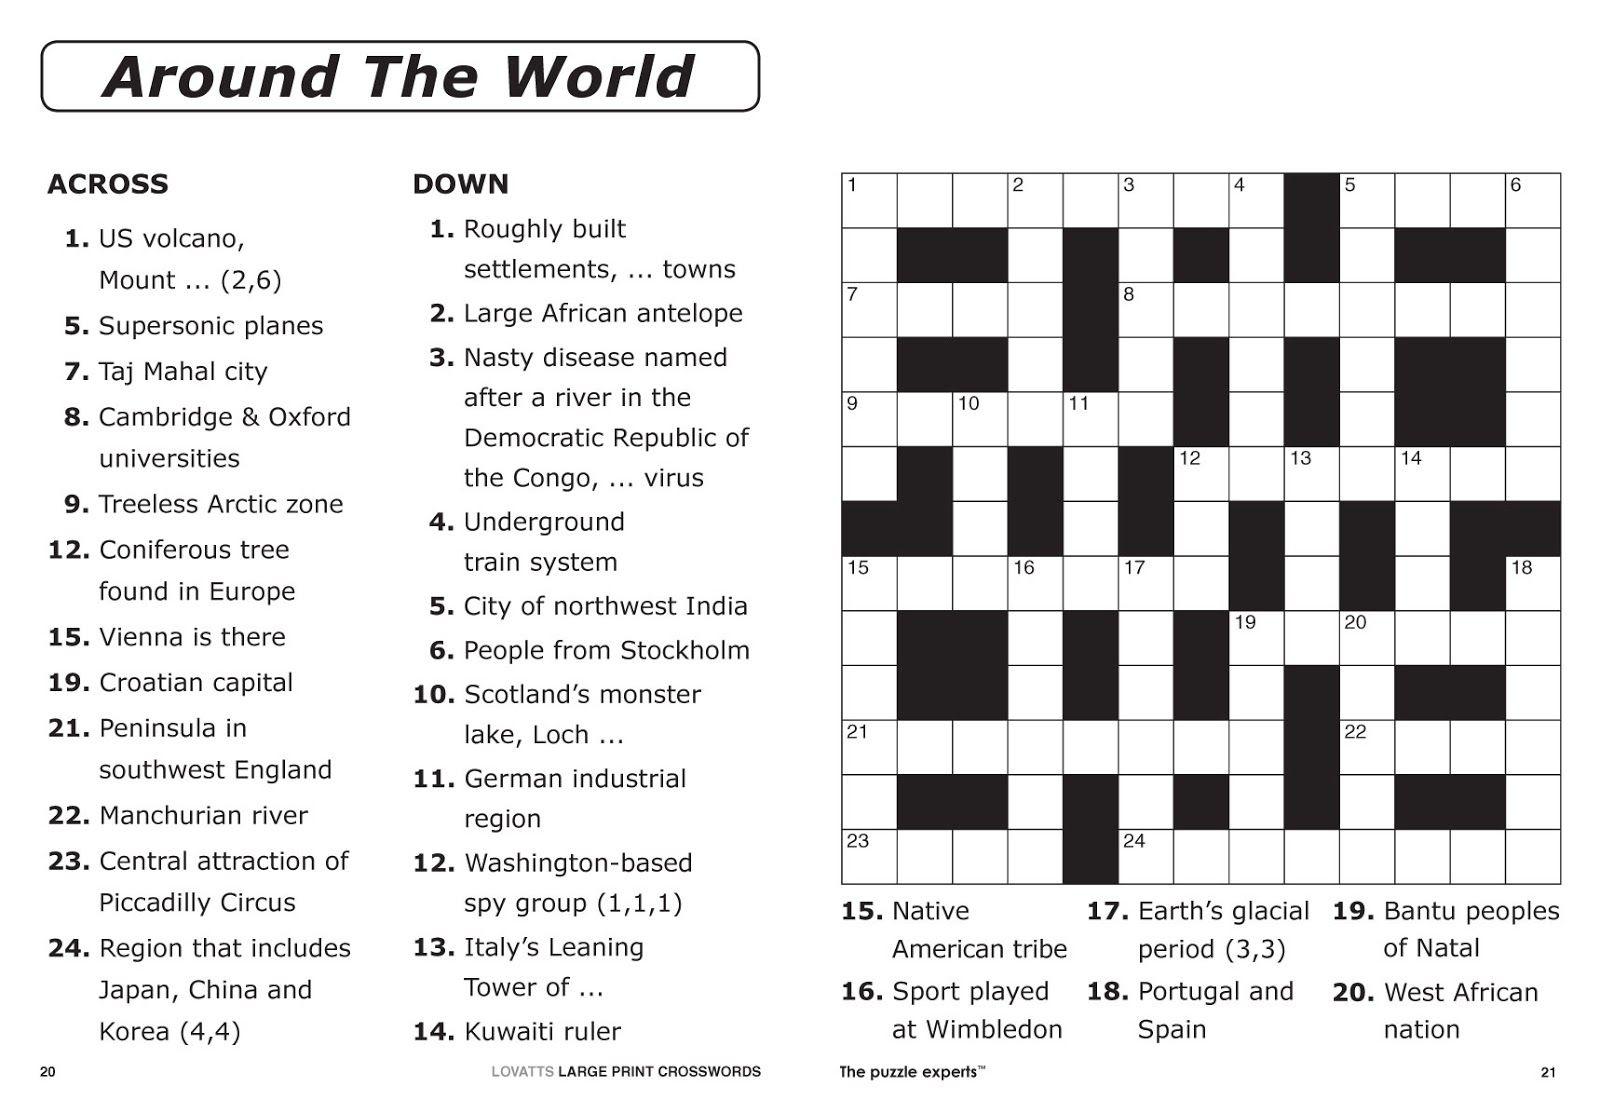 Free Printable Large Print Crossword Puzzles   M3U8 - Printable Crossword Puzzles For Adults Pdf